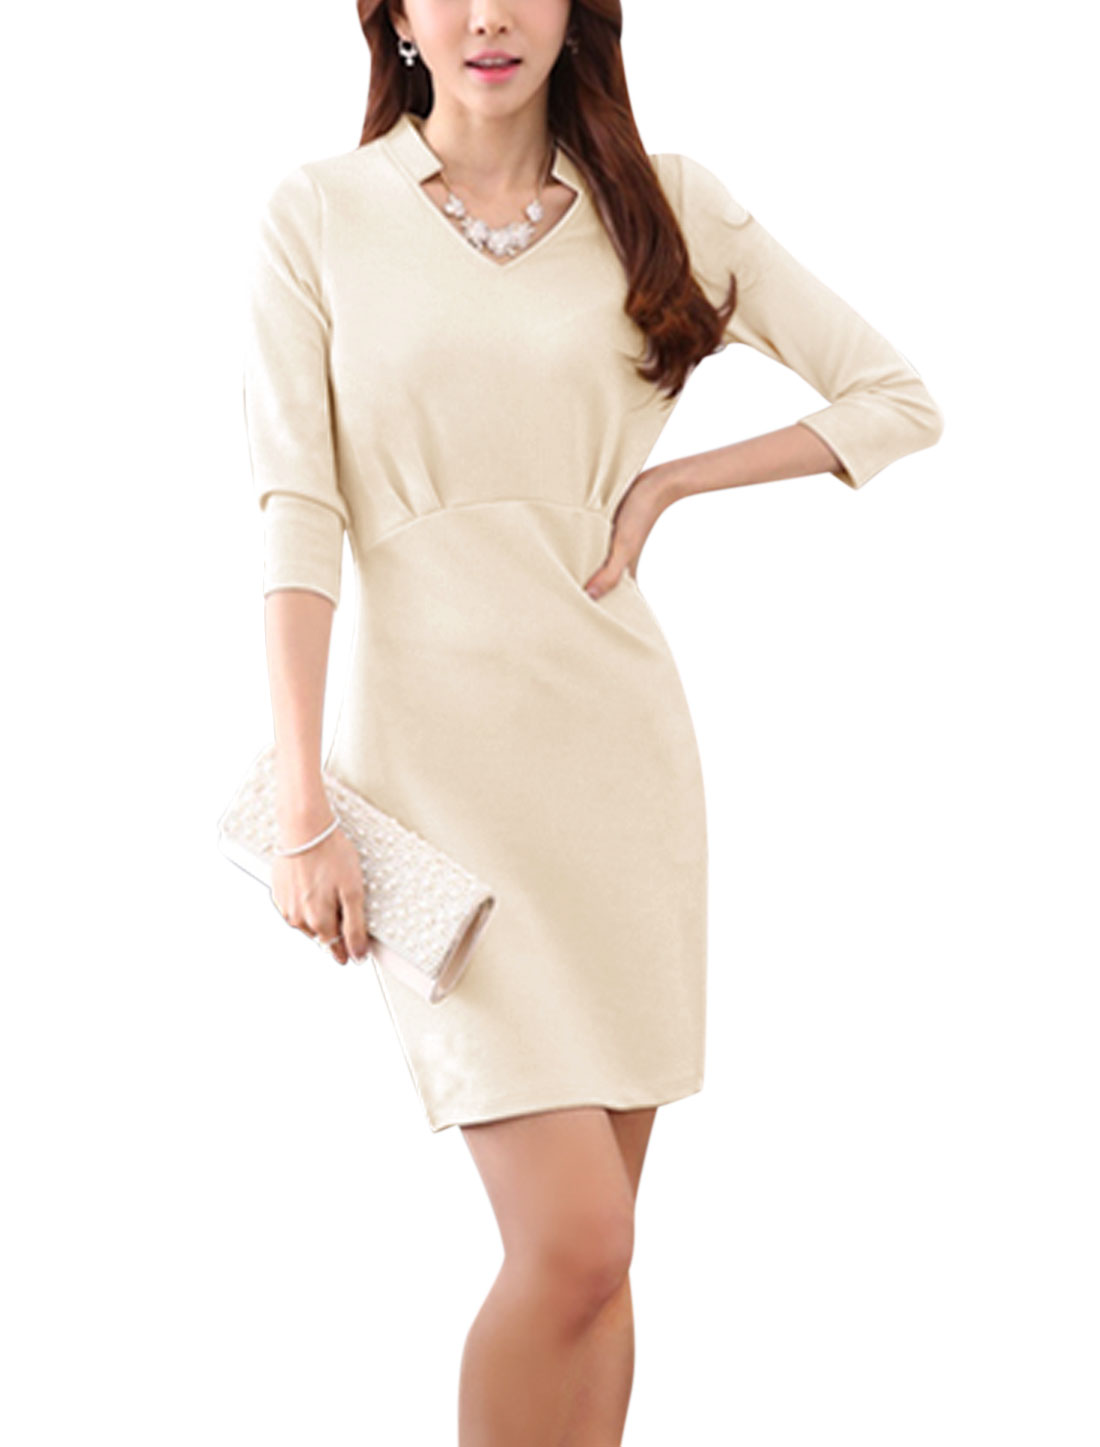 Women 3/4 Sleeve Texture Casual Sheath Dresses Pale Pink L